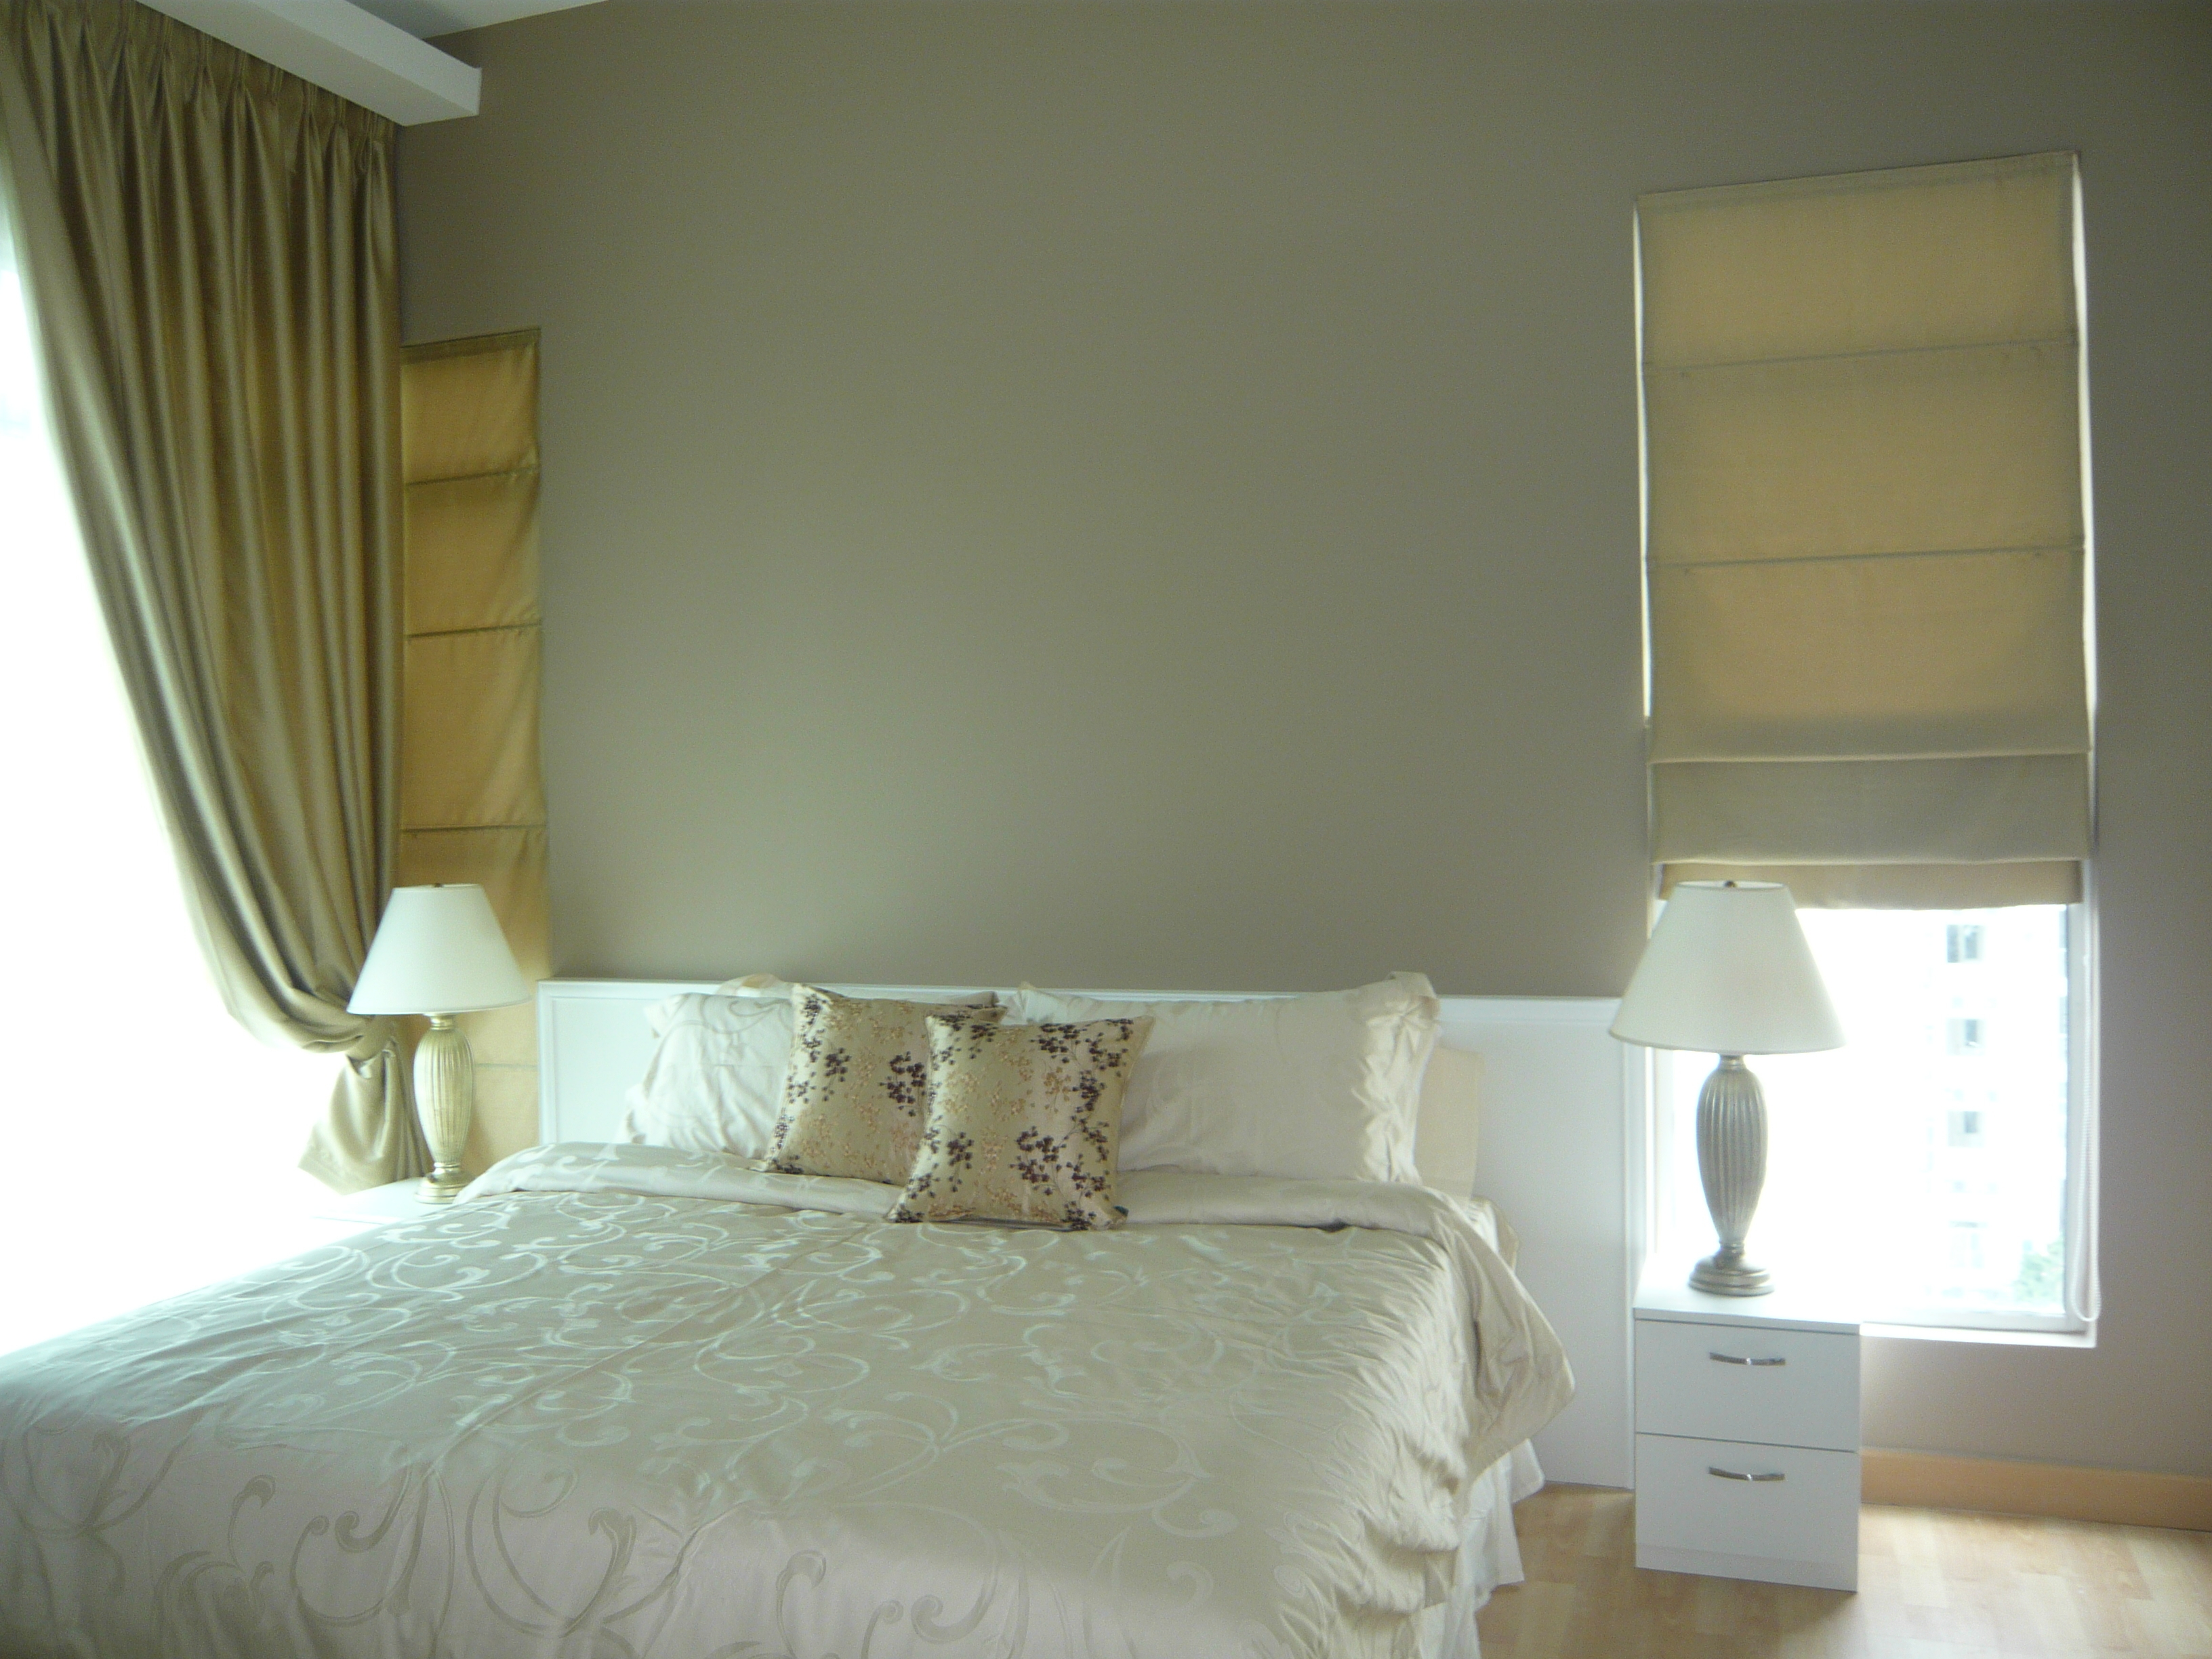 Interior Design - Amaya Saujana Condominium Subang Jaya Works